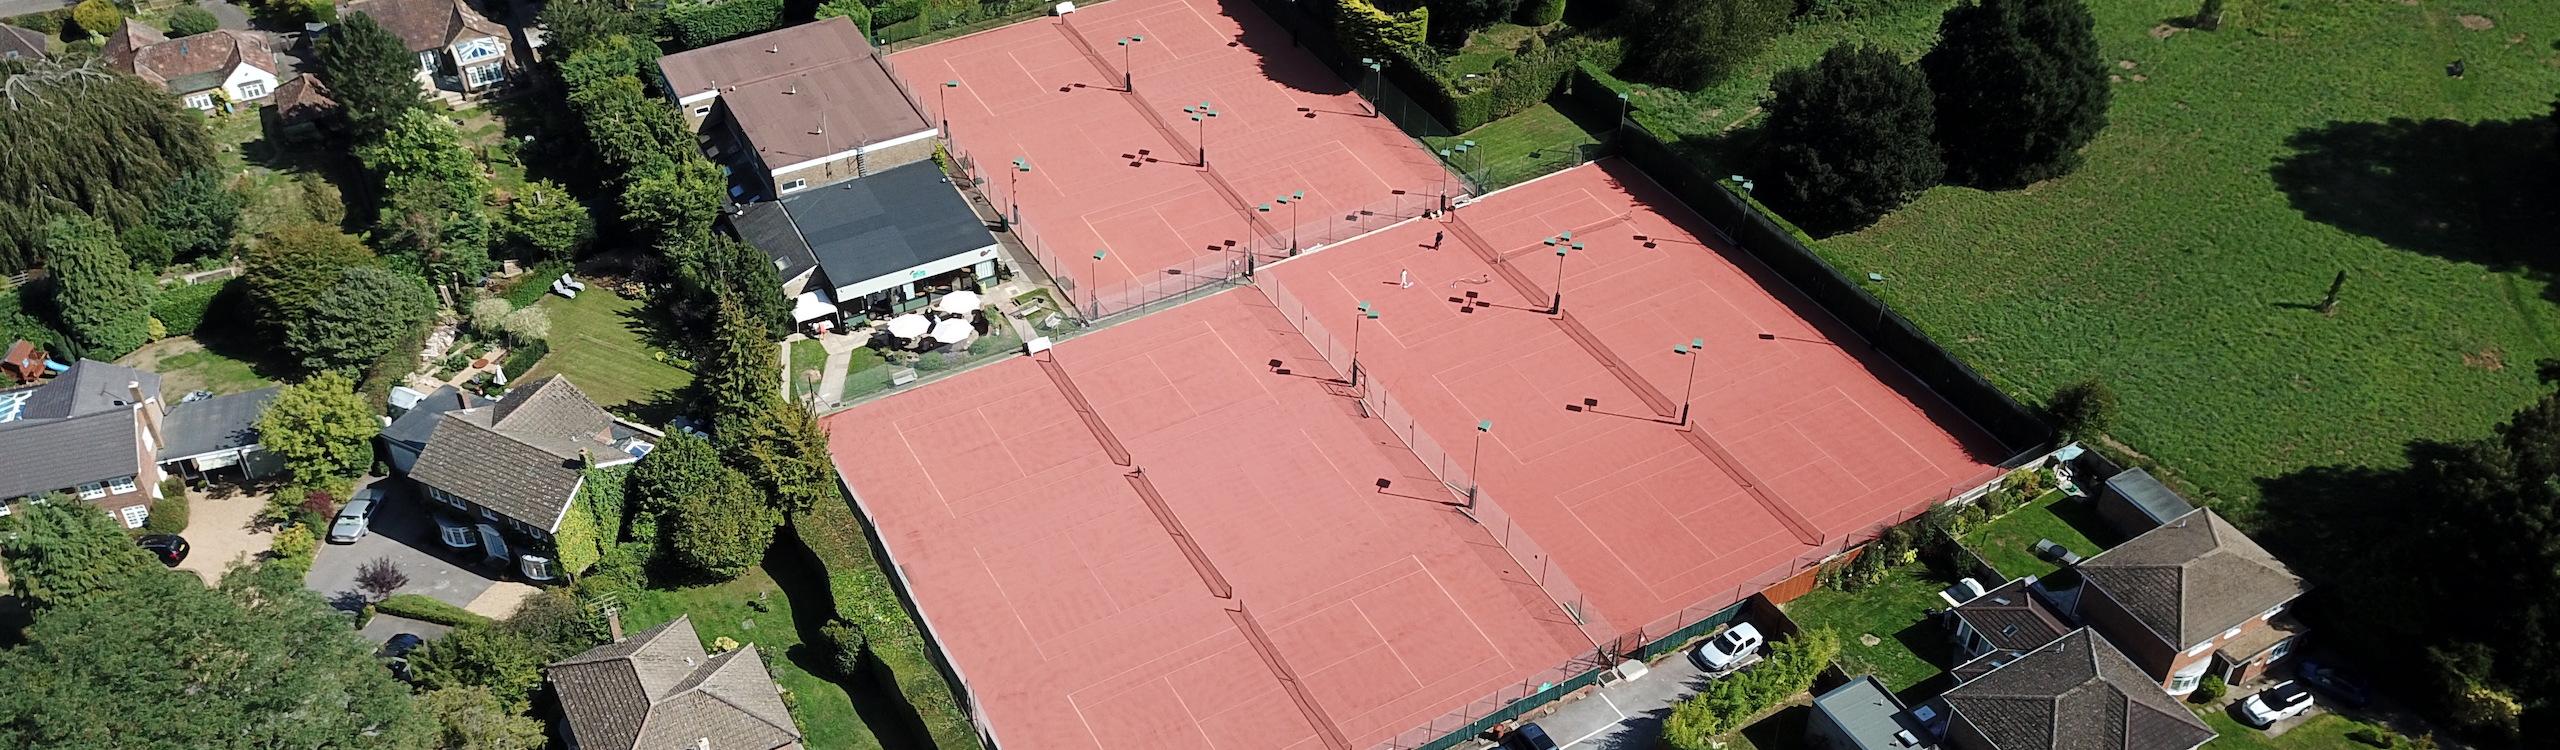 Dorking Lawn Tennis and Squash Club